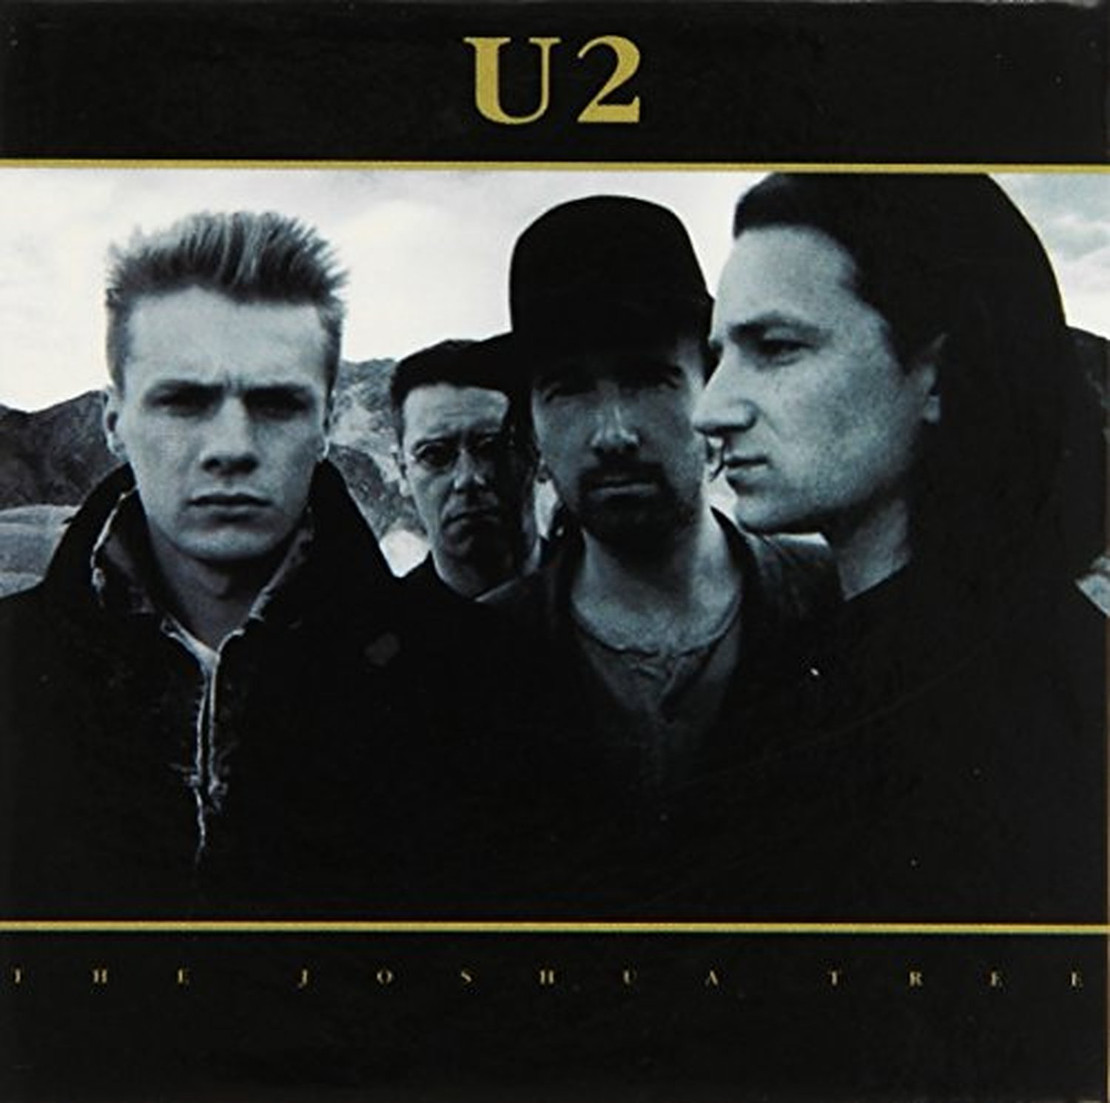 U2 to Perform Joshua Tree for Album's 30th Anniversary